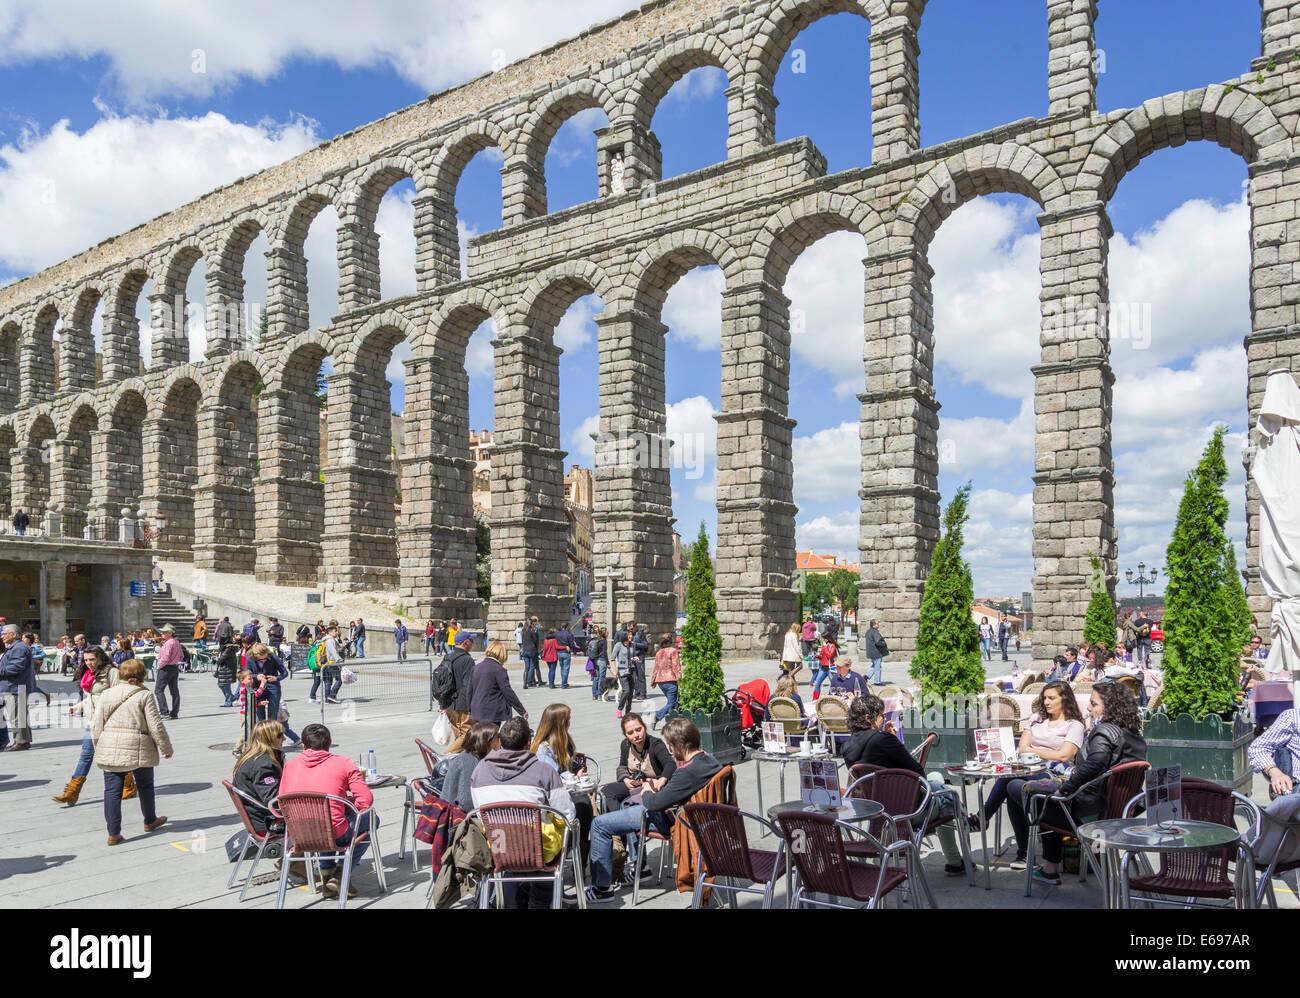 Roman Aqueduct, 1- 2.Jh AD, Segovia, Castile and León, Spain - Stock Image